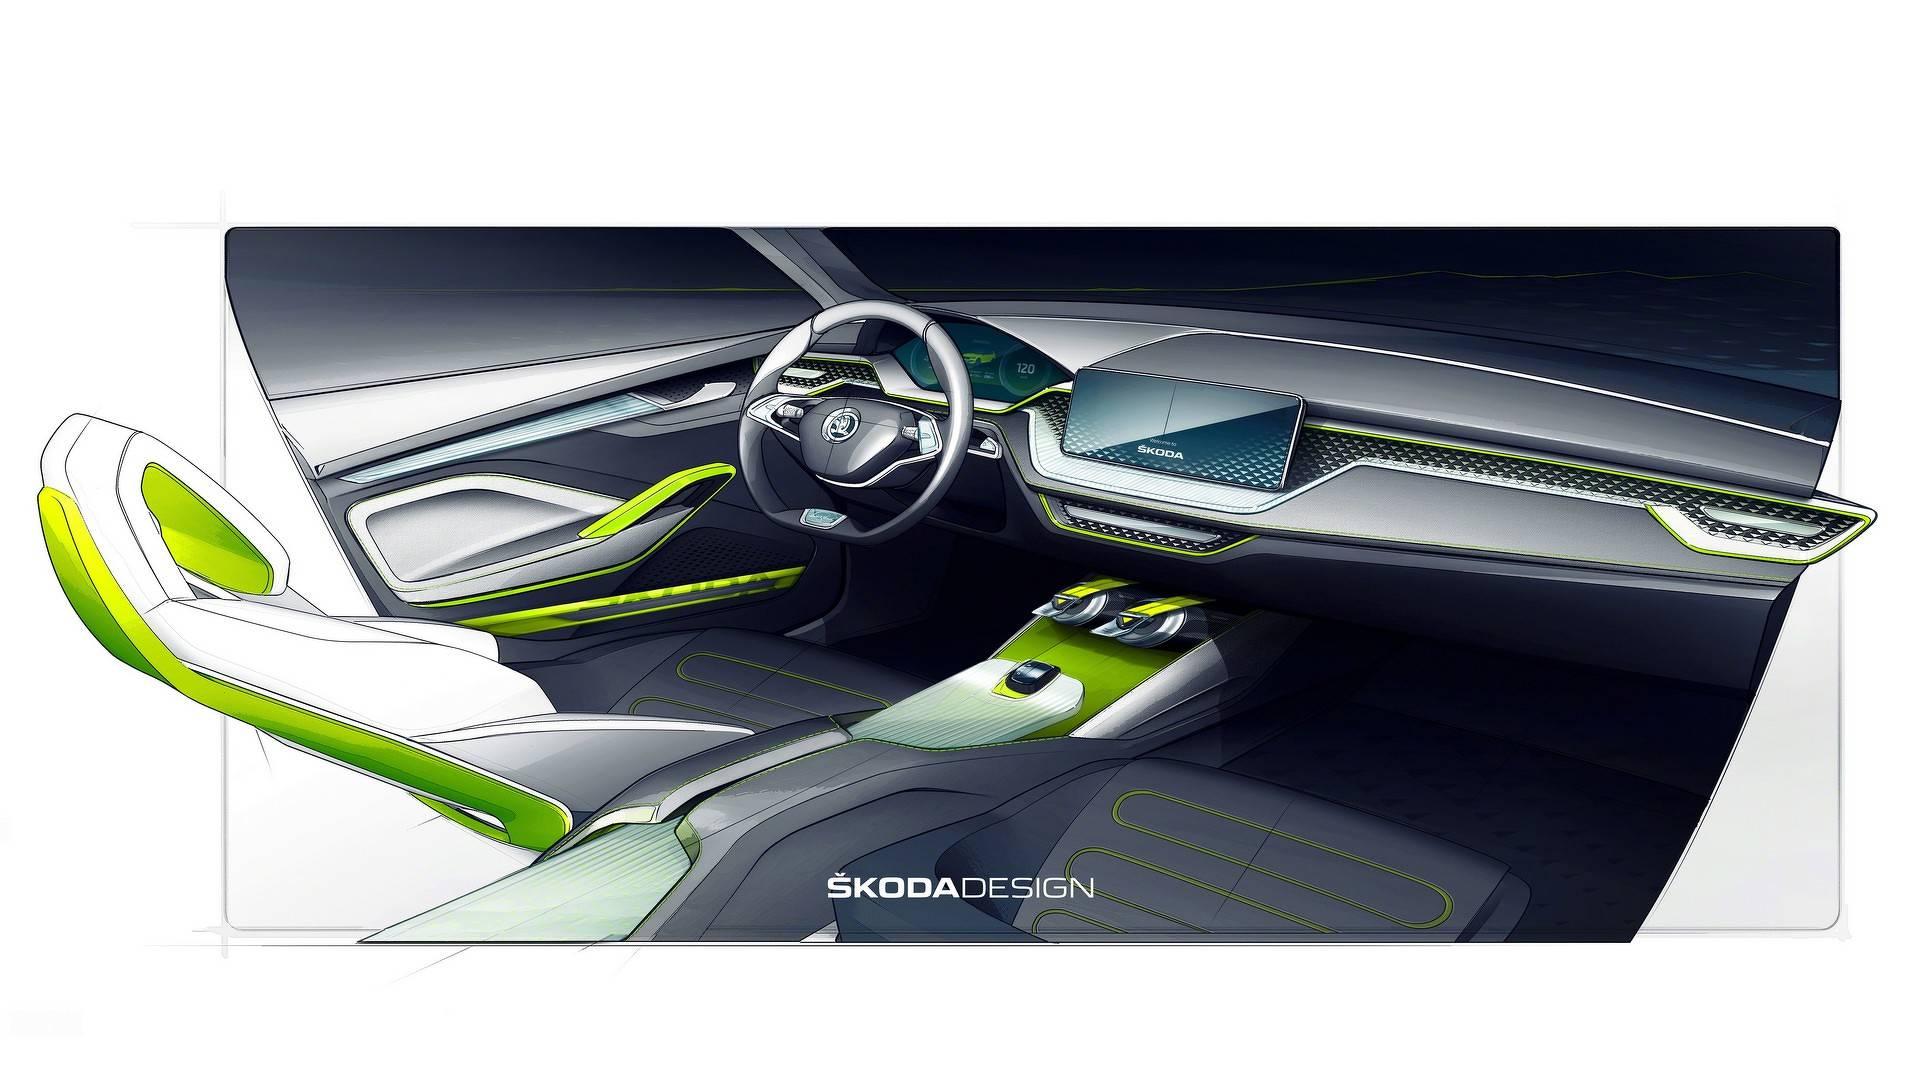 5a965b11990b5 skoda vision x concept اسکودا ایکس یک خودرو کاملا منحصر و زیبا   اجاره ماشین